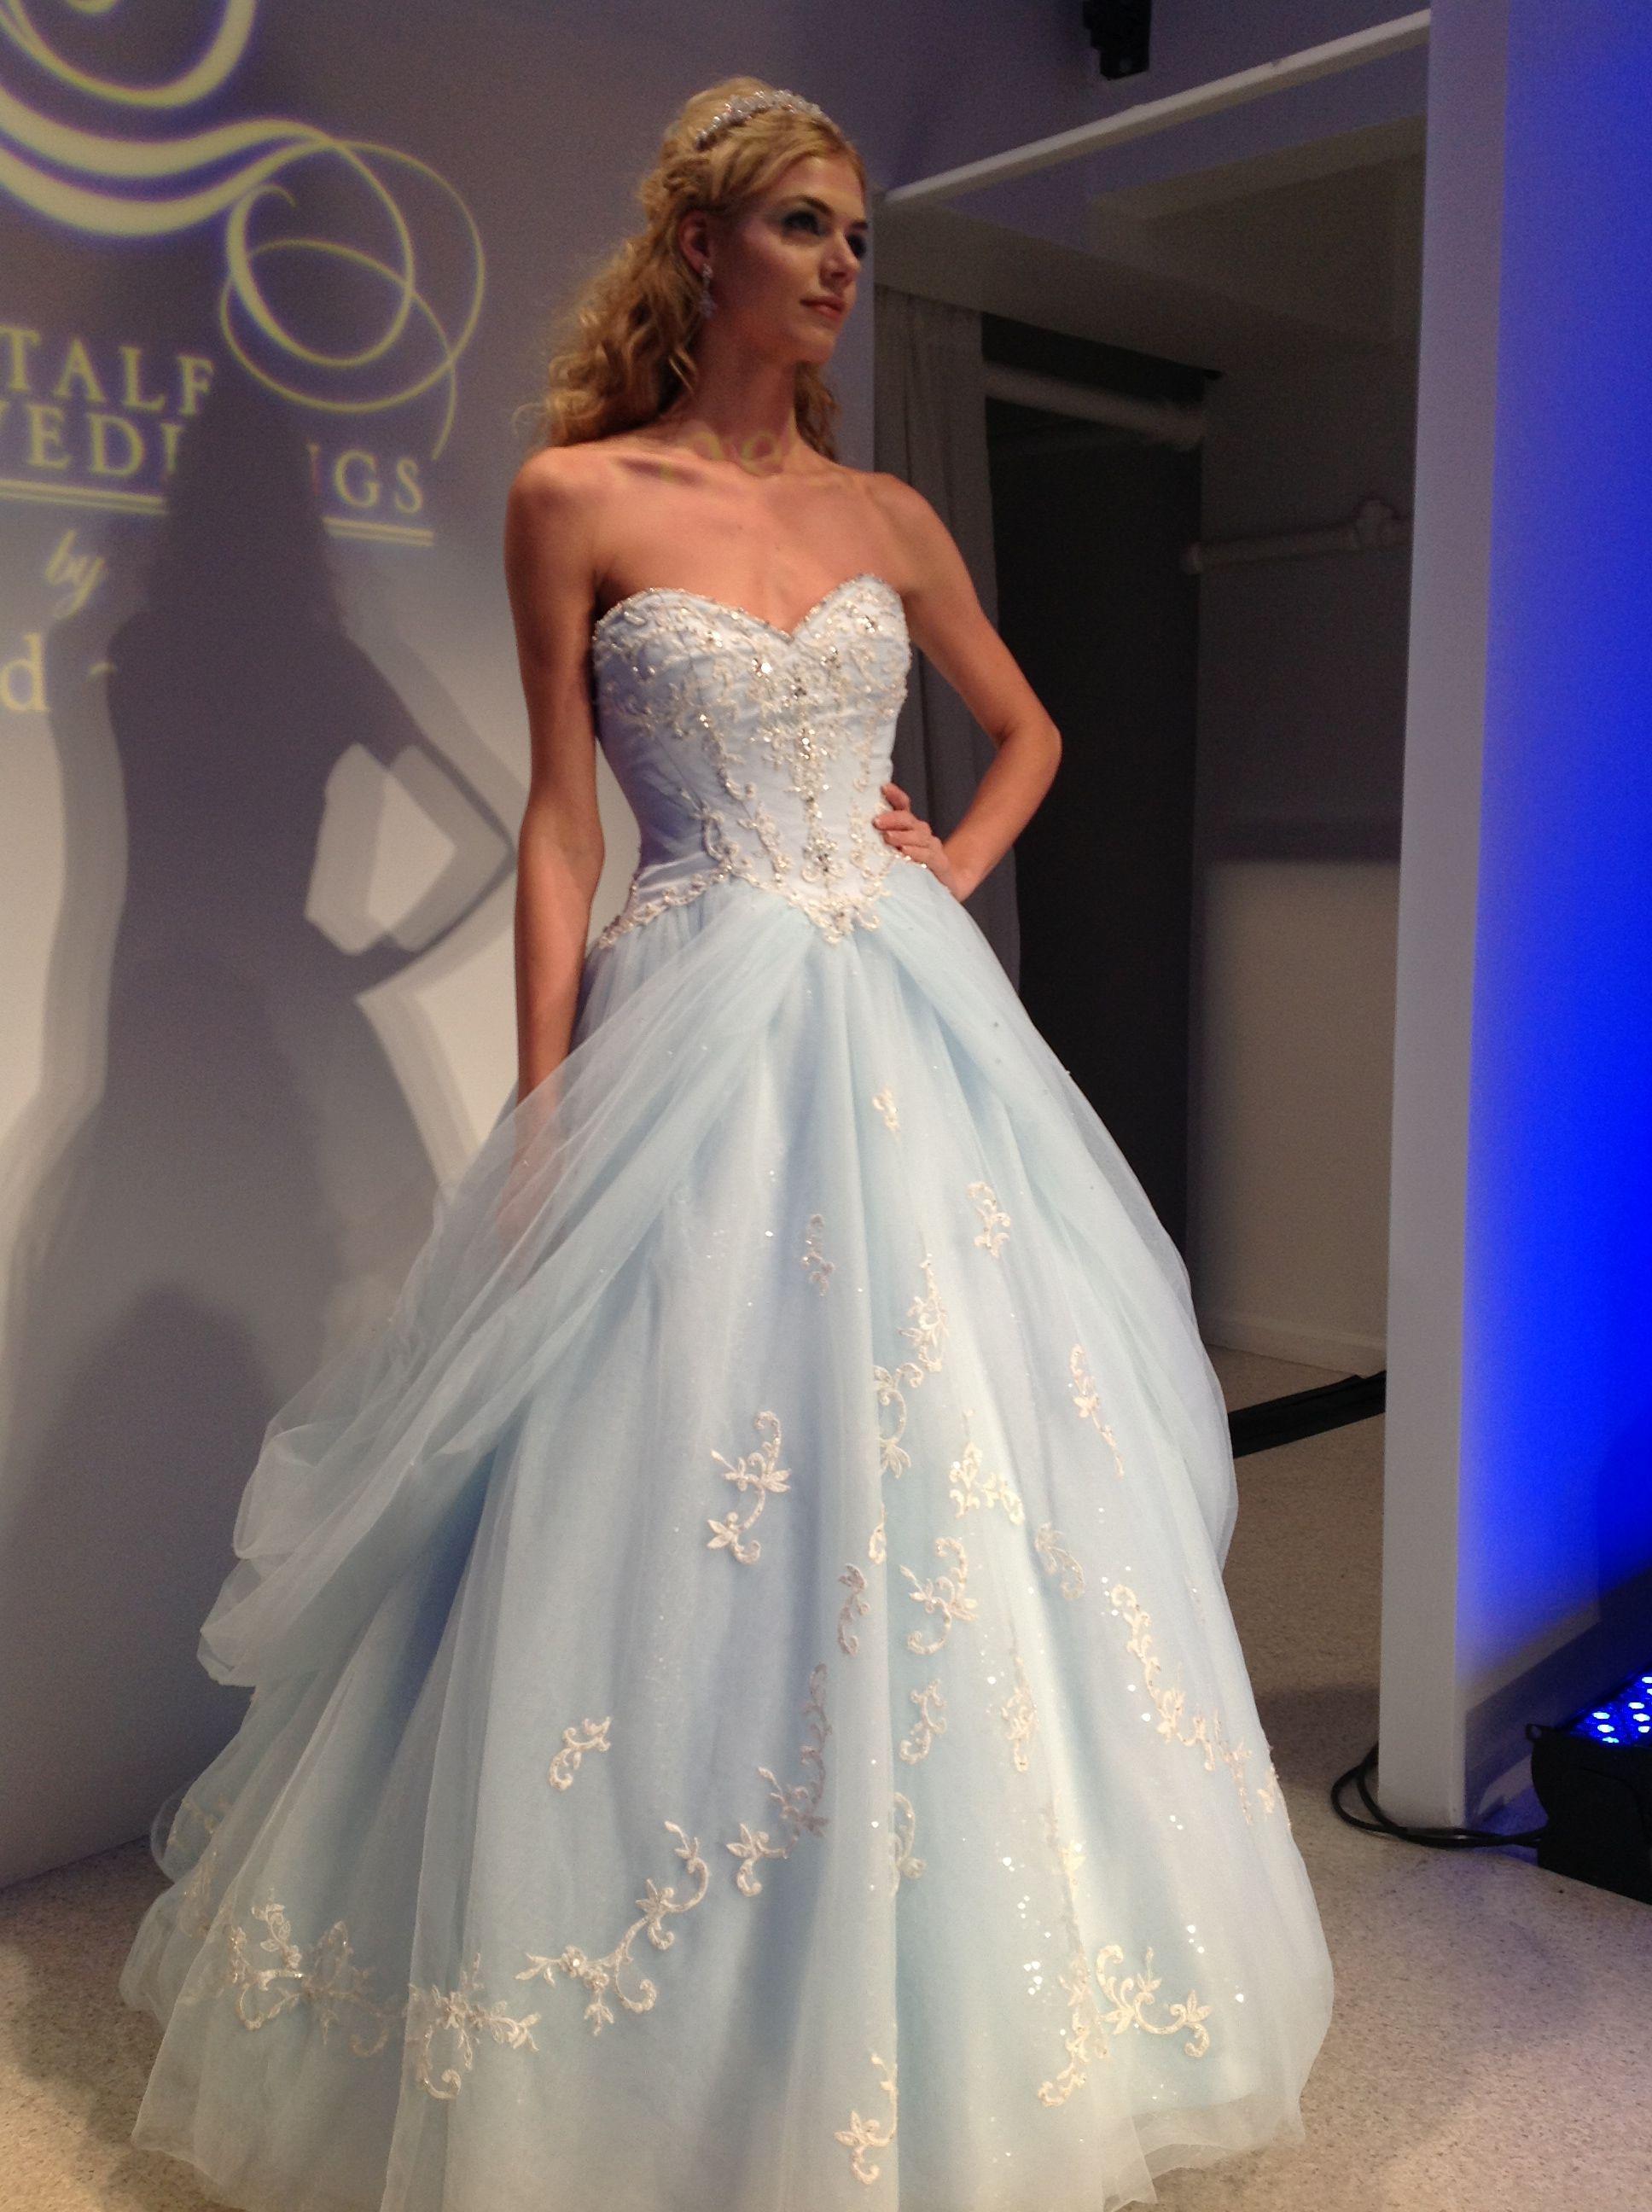 White and blue wedding dresses  Cinderella Wedding Dress  Dresses to Wow  Pinterest  Cinderella